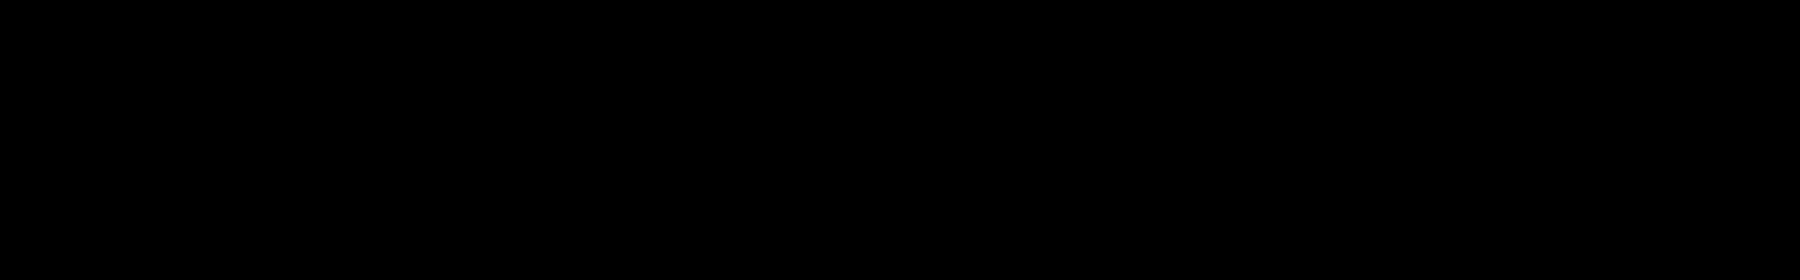 Jack Ultimate 2 audio waveform